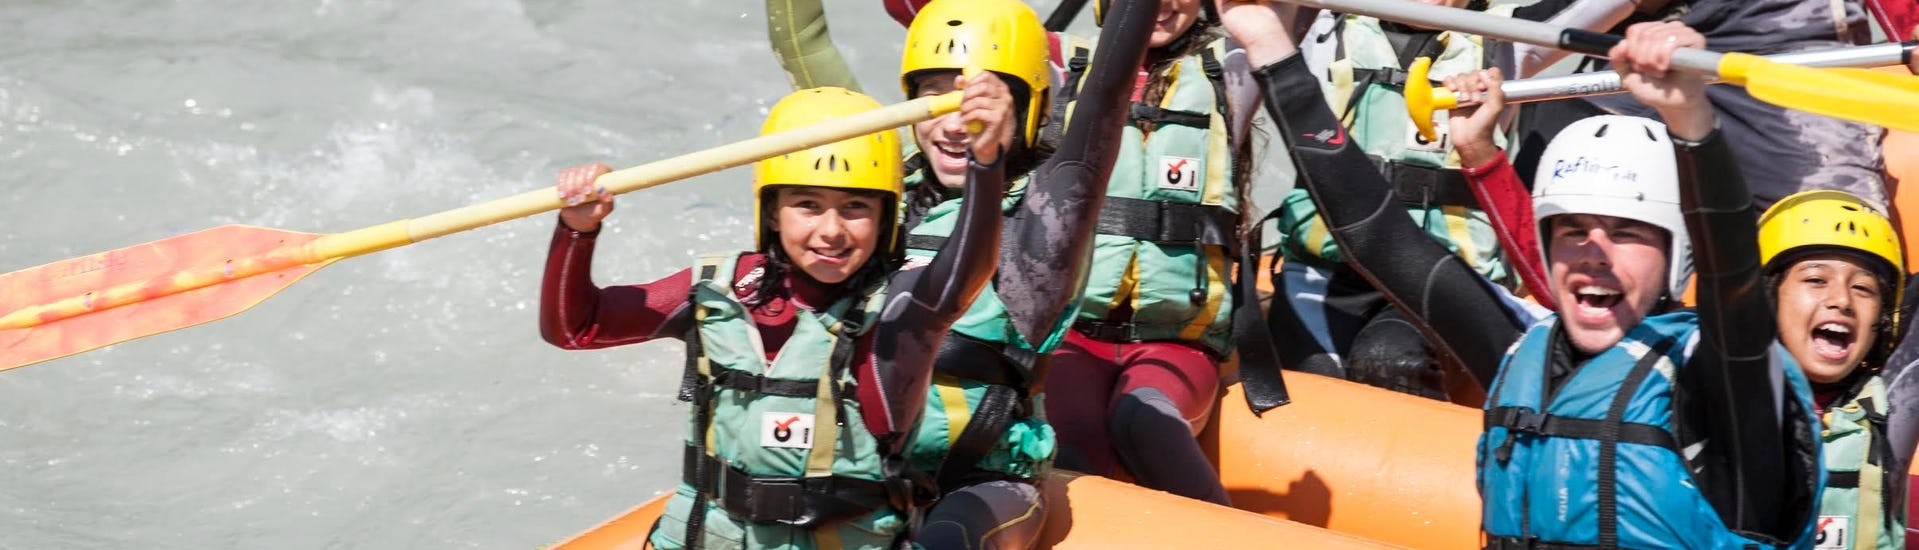 rafting-on-the-dora-baltea-for-families-long-route-raftingit-hero